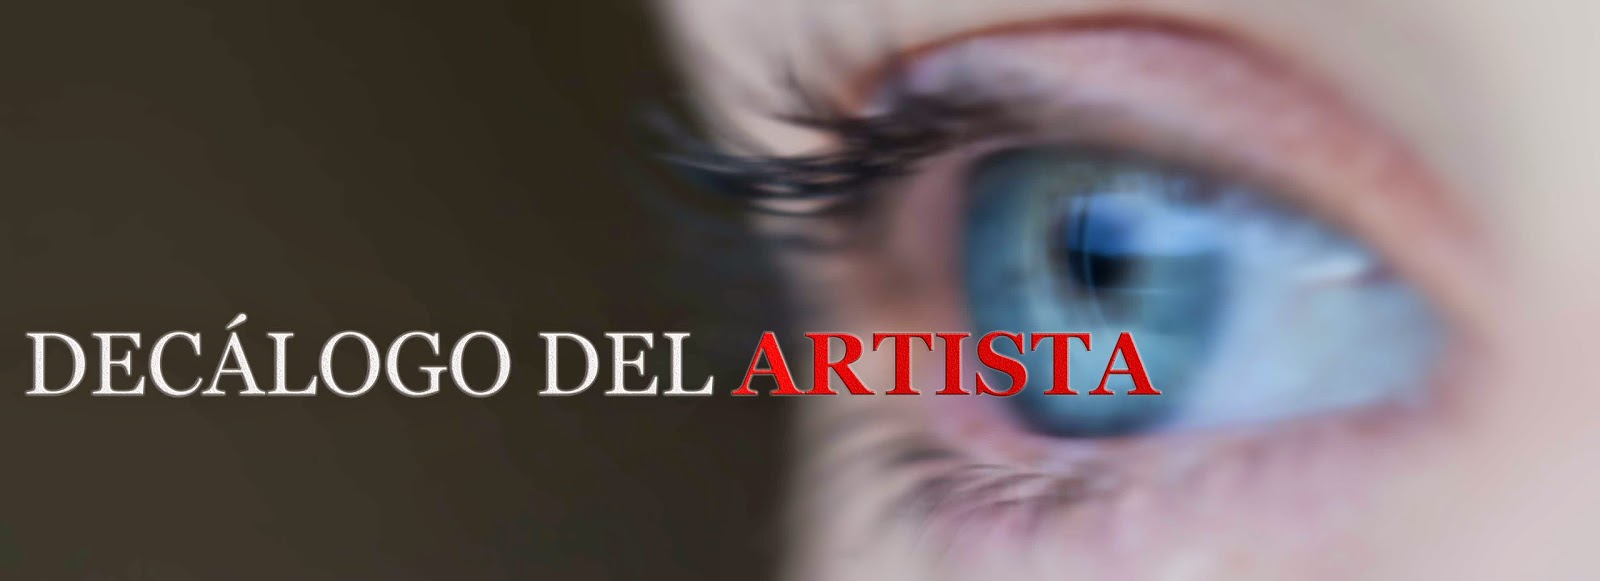 Gabriela Mistral decalogo del artista